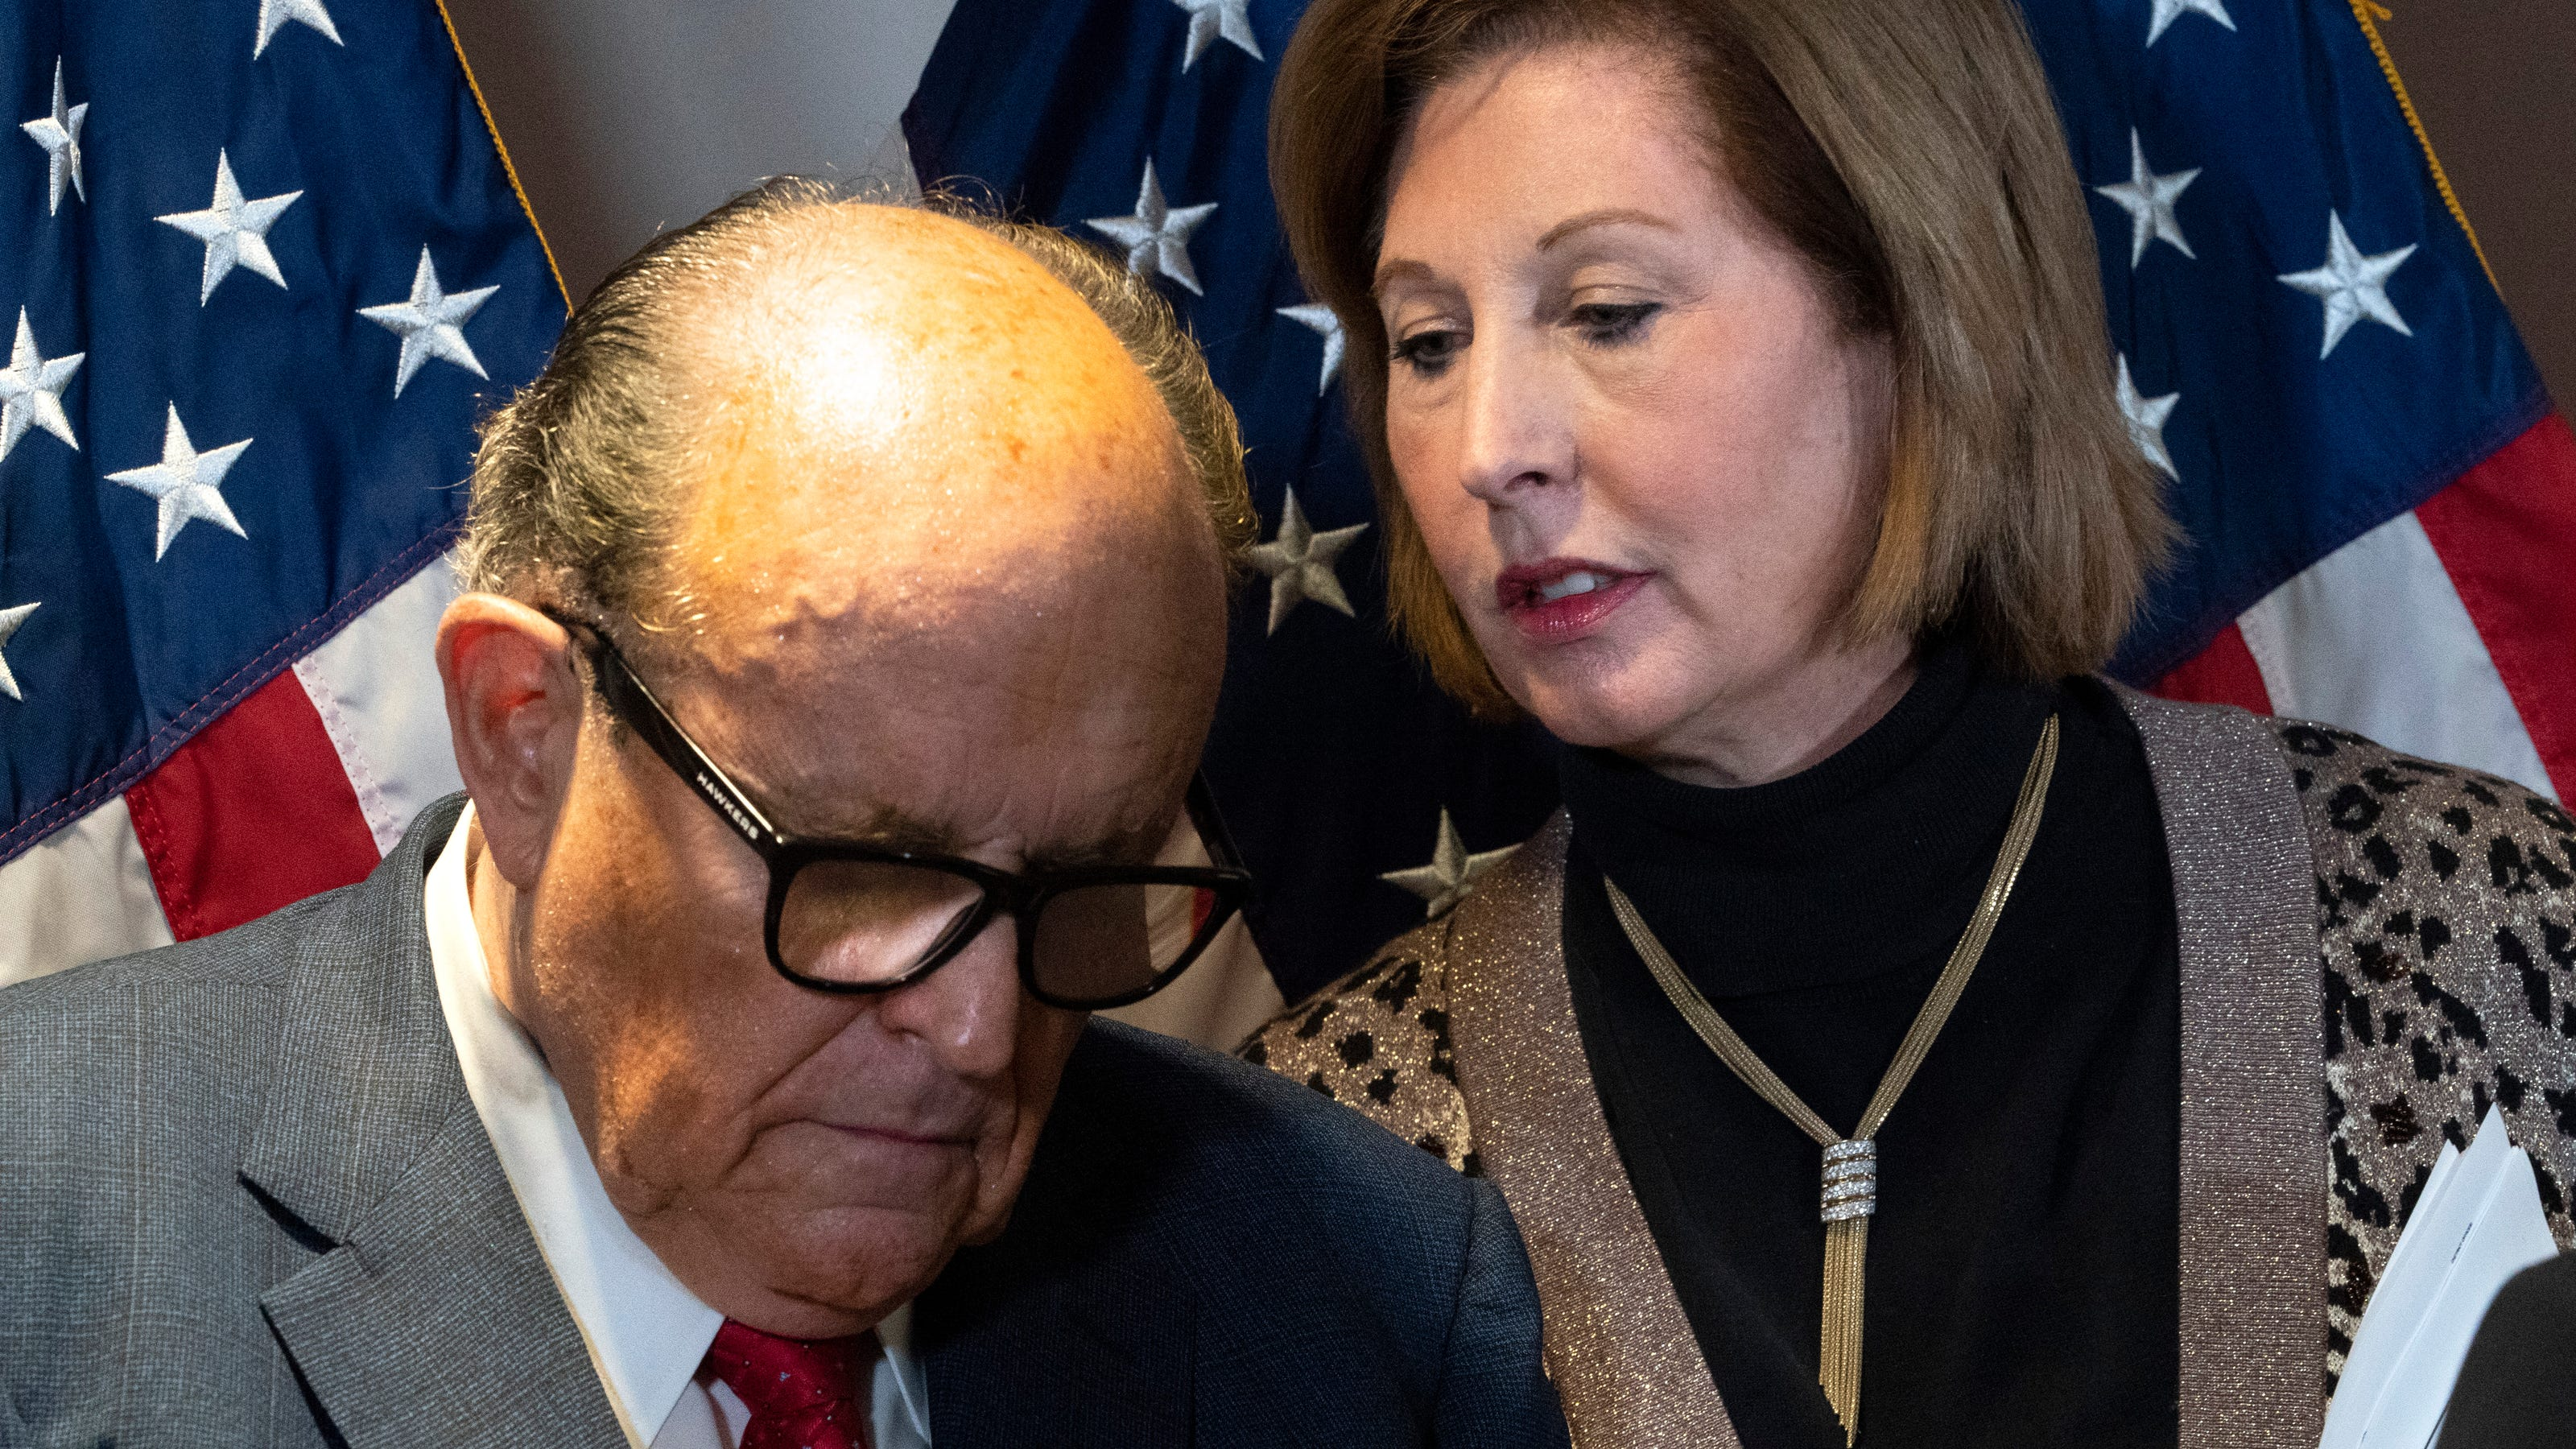 Election 2020 live updates: Trump legal team distances itself from lawyer Sidney Powell, Biden taps Blinken as secretary of state